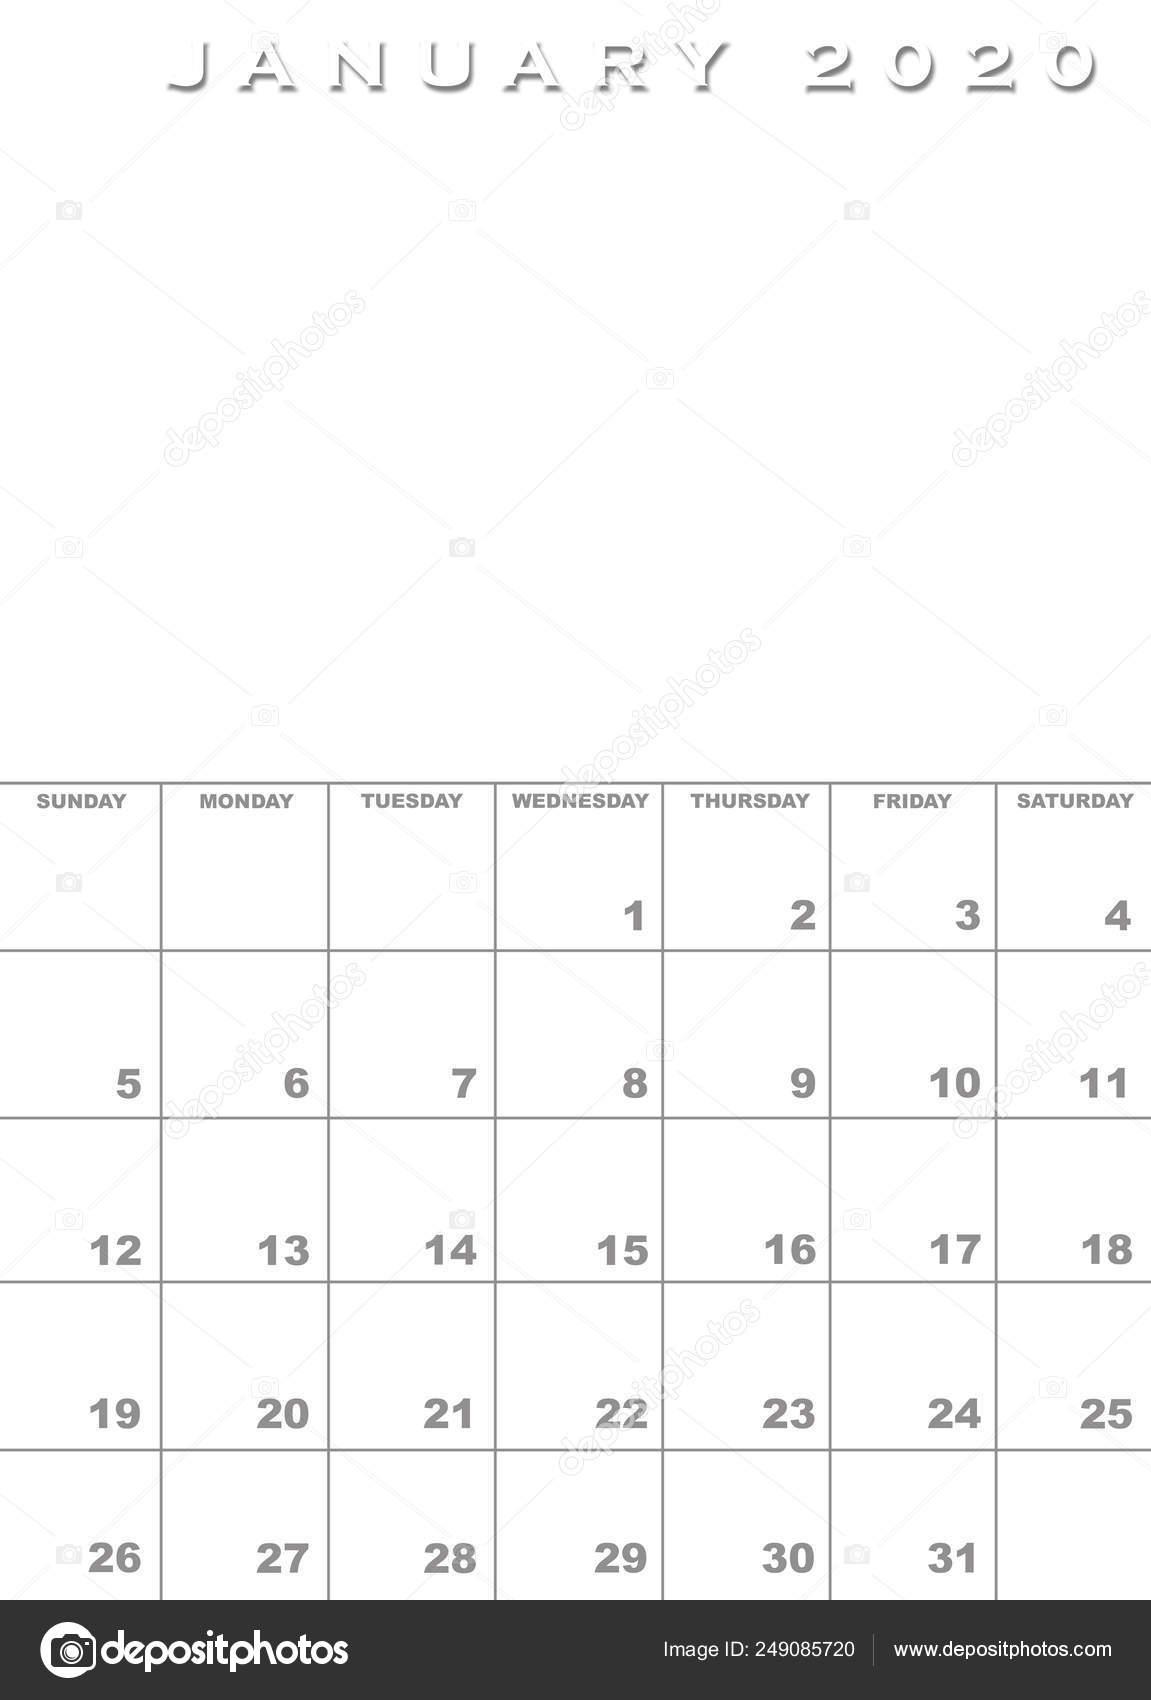 Immagini Calendario 2020 Gennaio.Modello Di Calendario Gennaio 2020 Foto Stock C Paulvinten